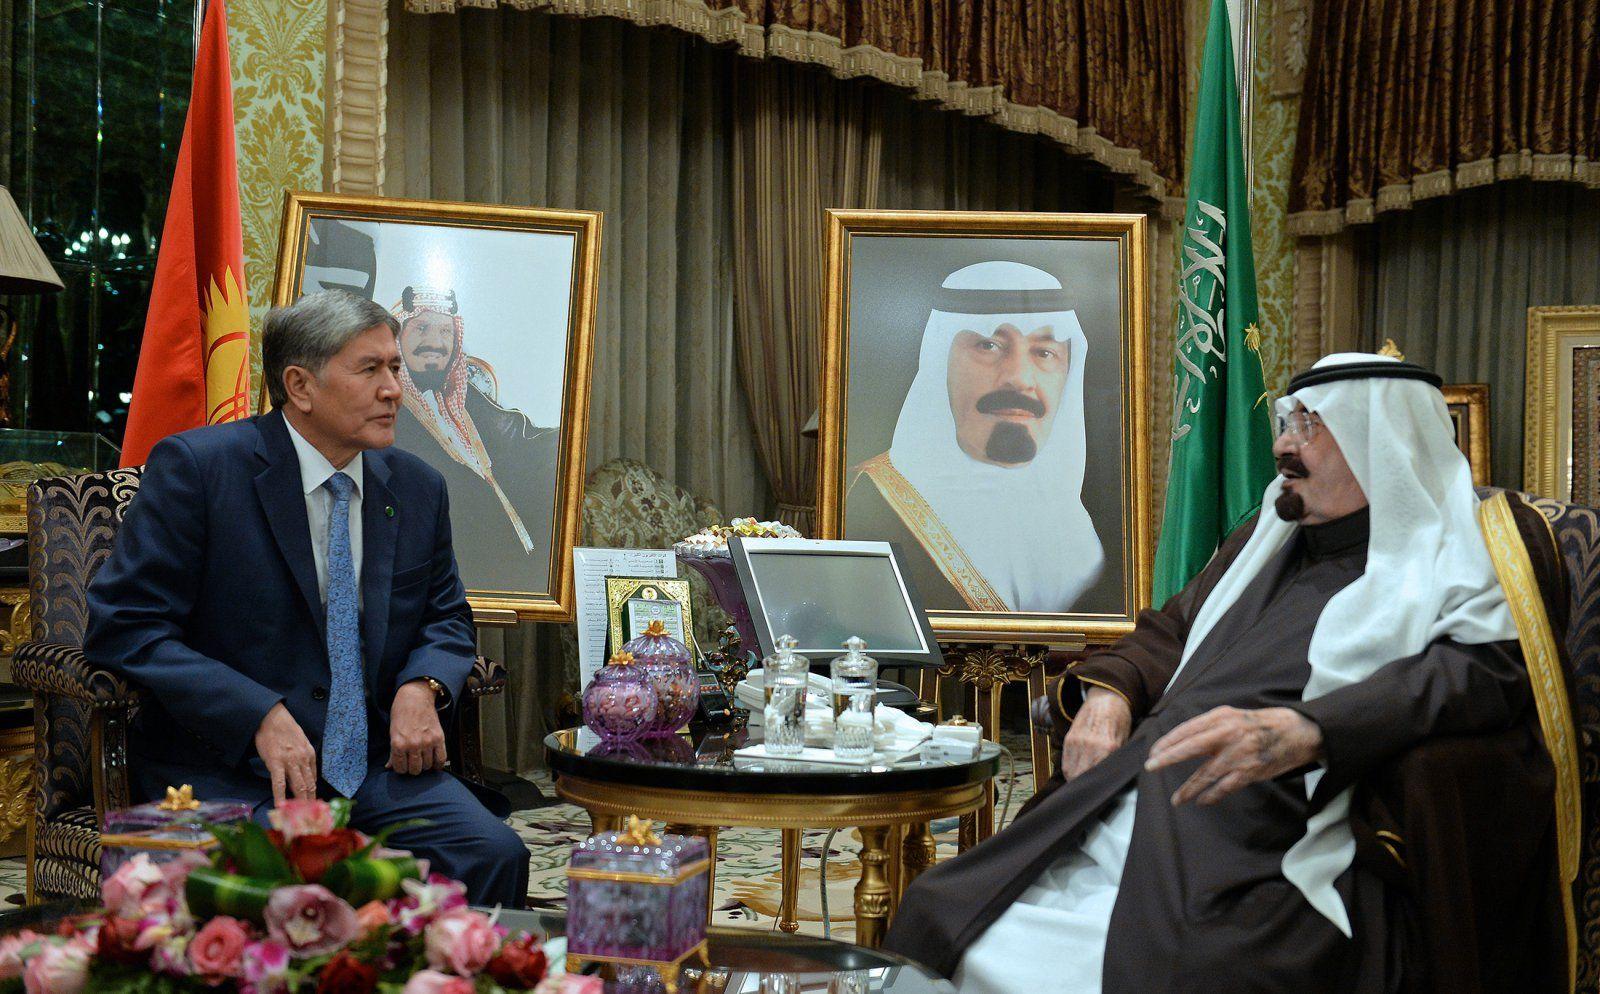 Atambajew auf Staatsbesuch in Saudi Arabien mit König Abdullah